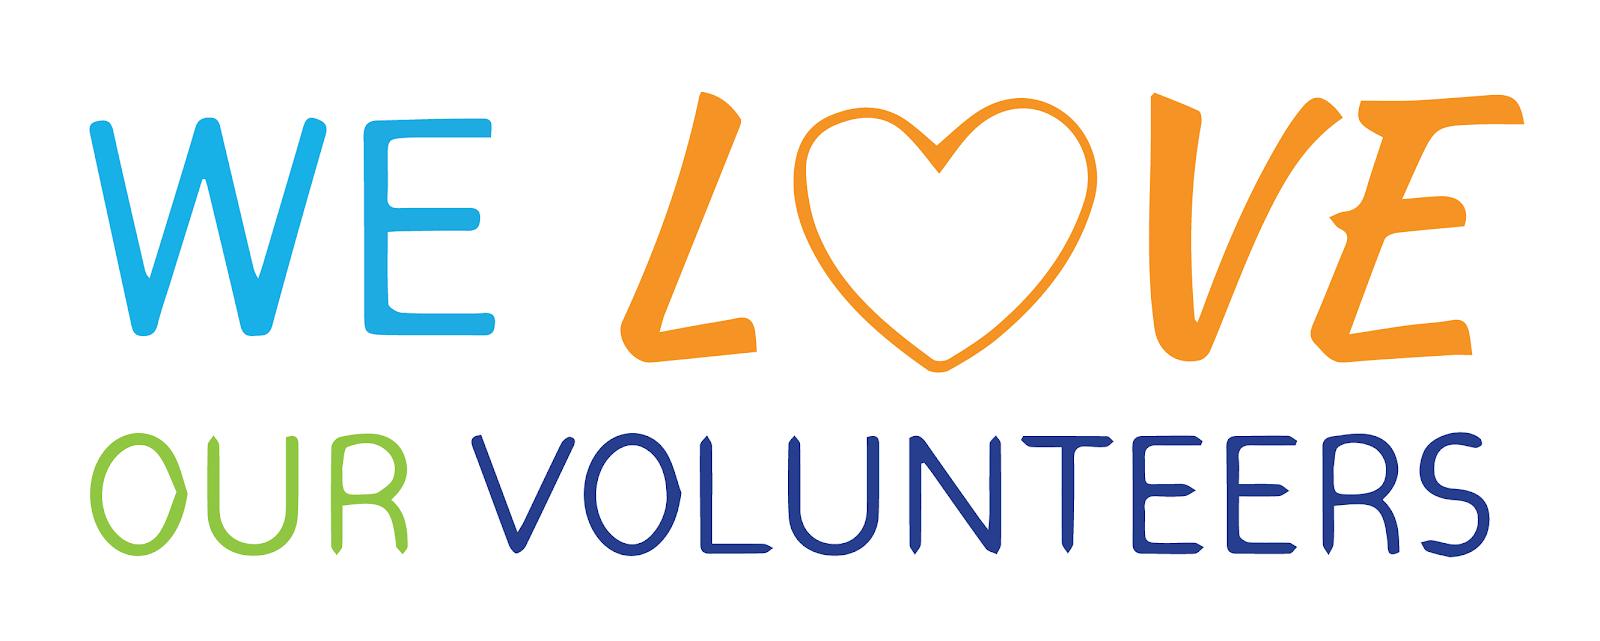 Volunteering at Diamond Point - Promise of Excellence - Diamond Point  Elementary School